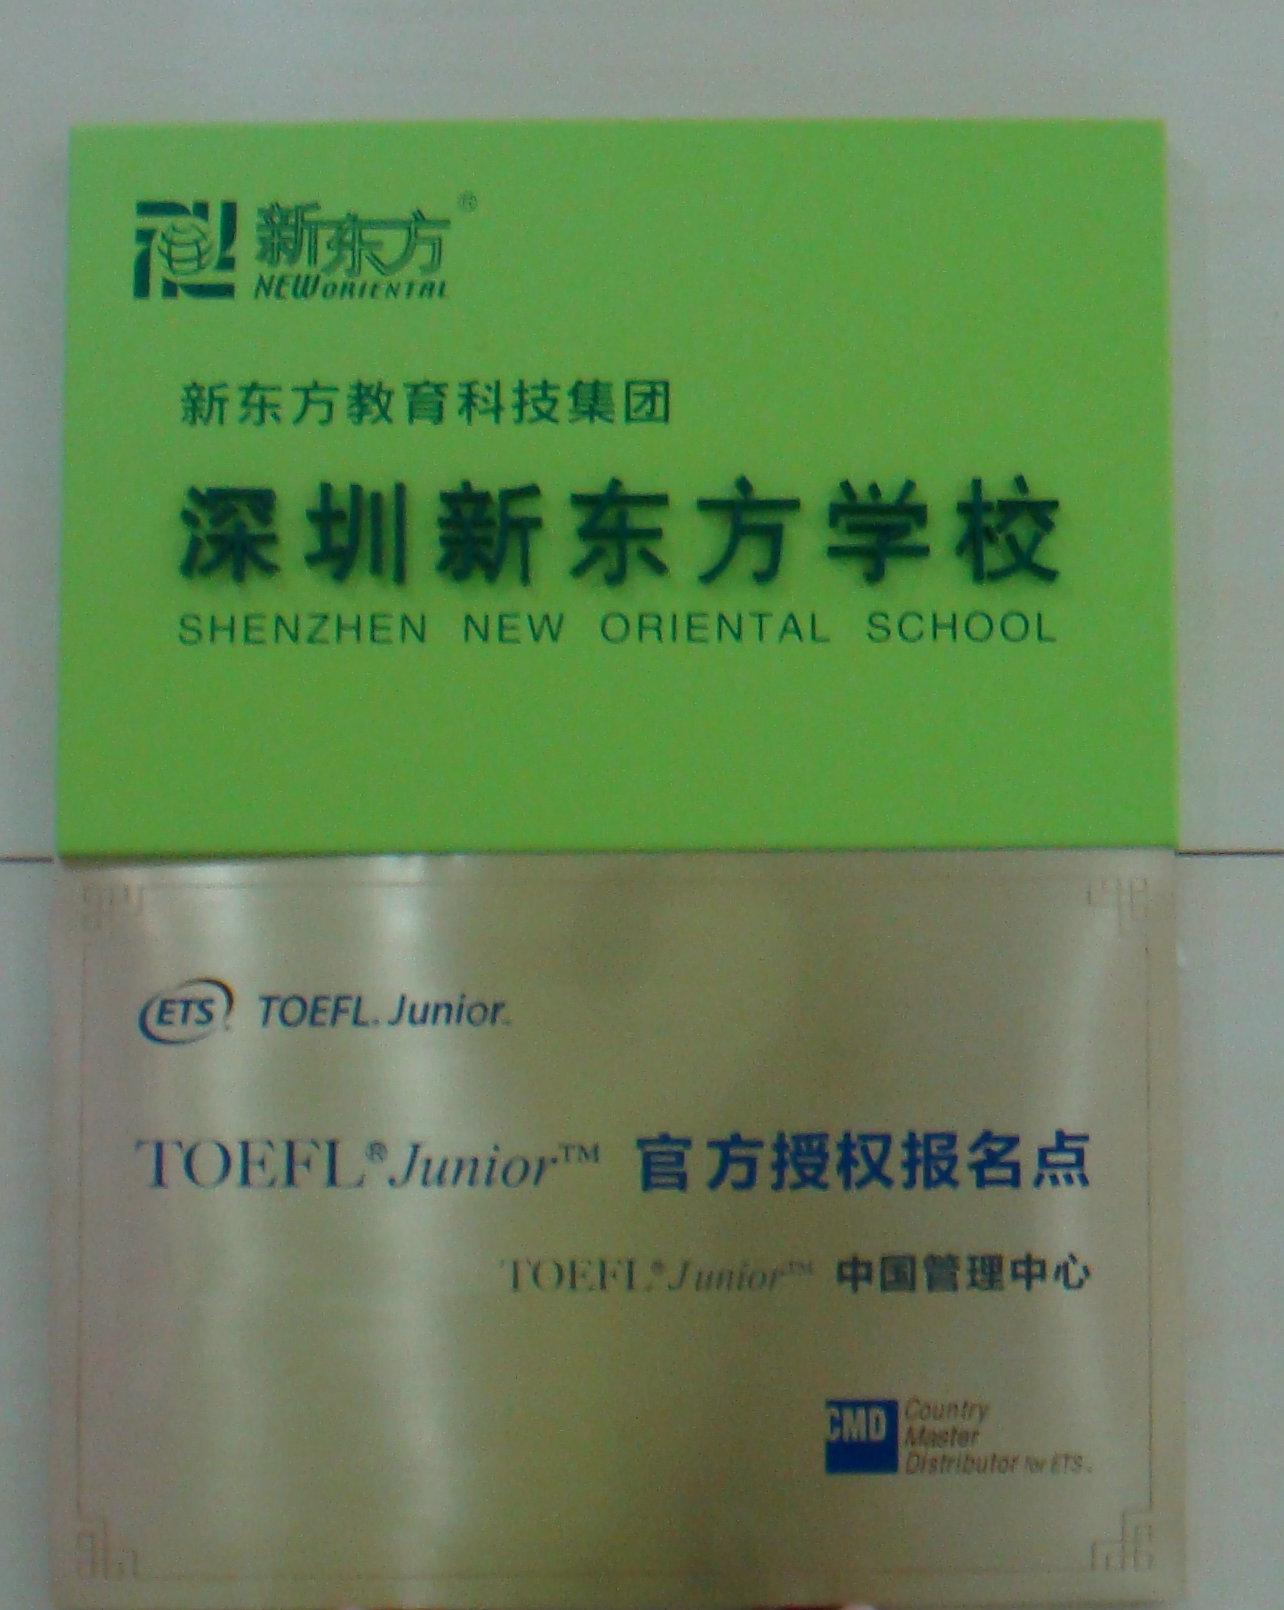 TJ授權與新東方logo